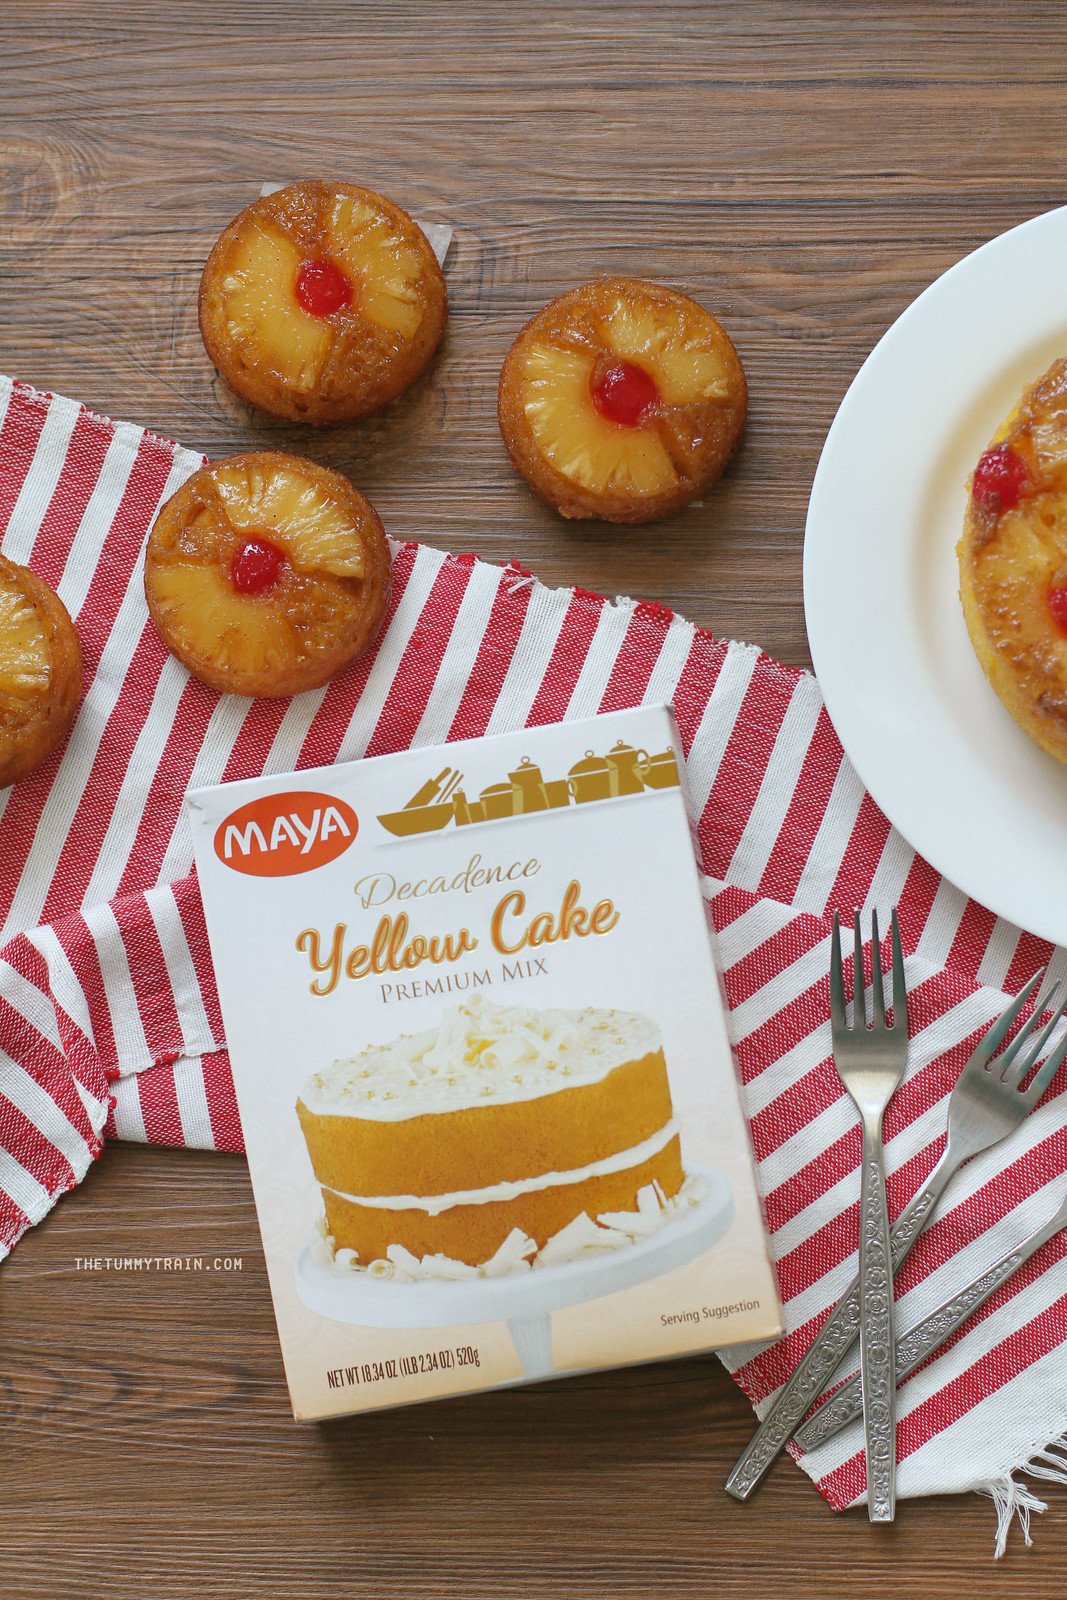 33207553514 574305fcf1 h - Taste Test: Maya Yellow Cake Mix Pineapple Upside Down Cake